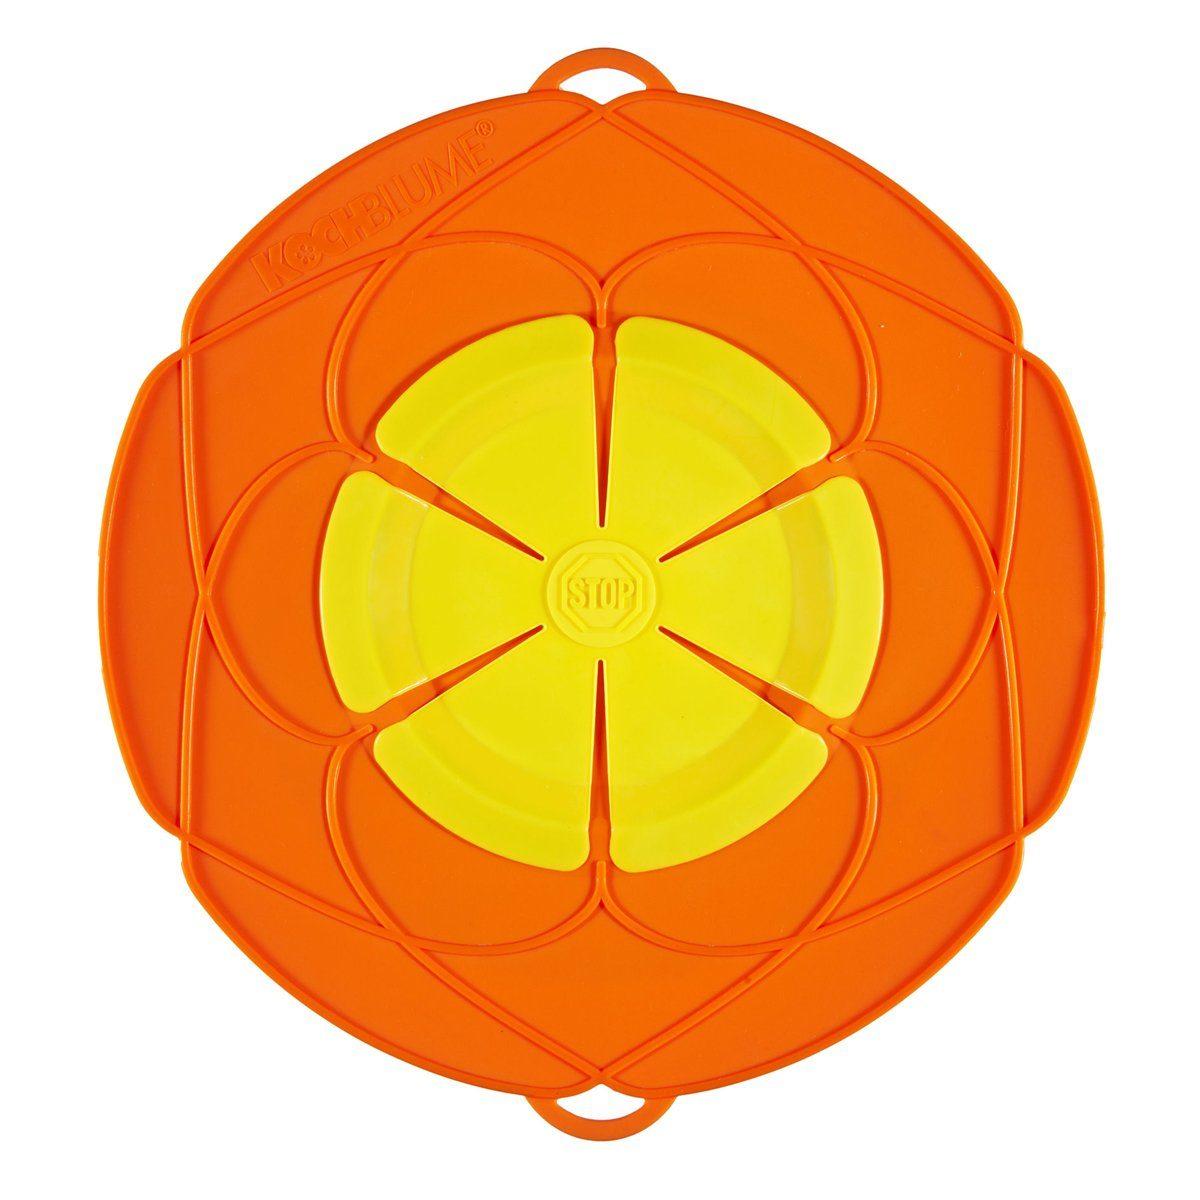 Kochblume Kochblume Überkochschutz orange 33 cm